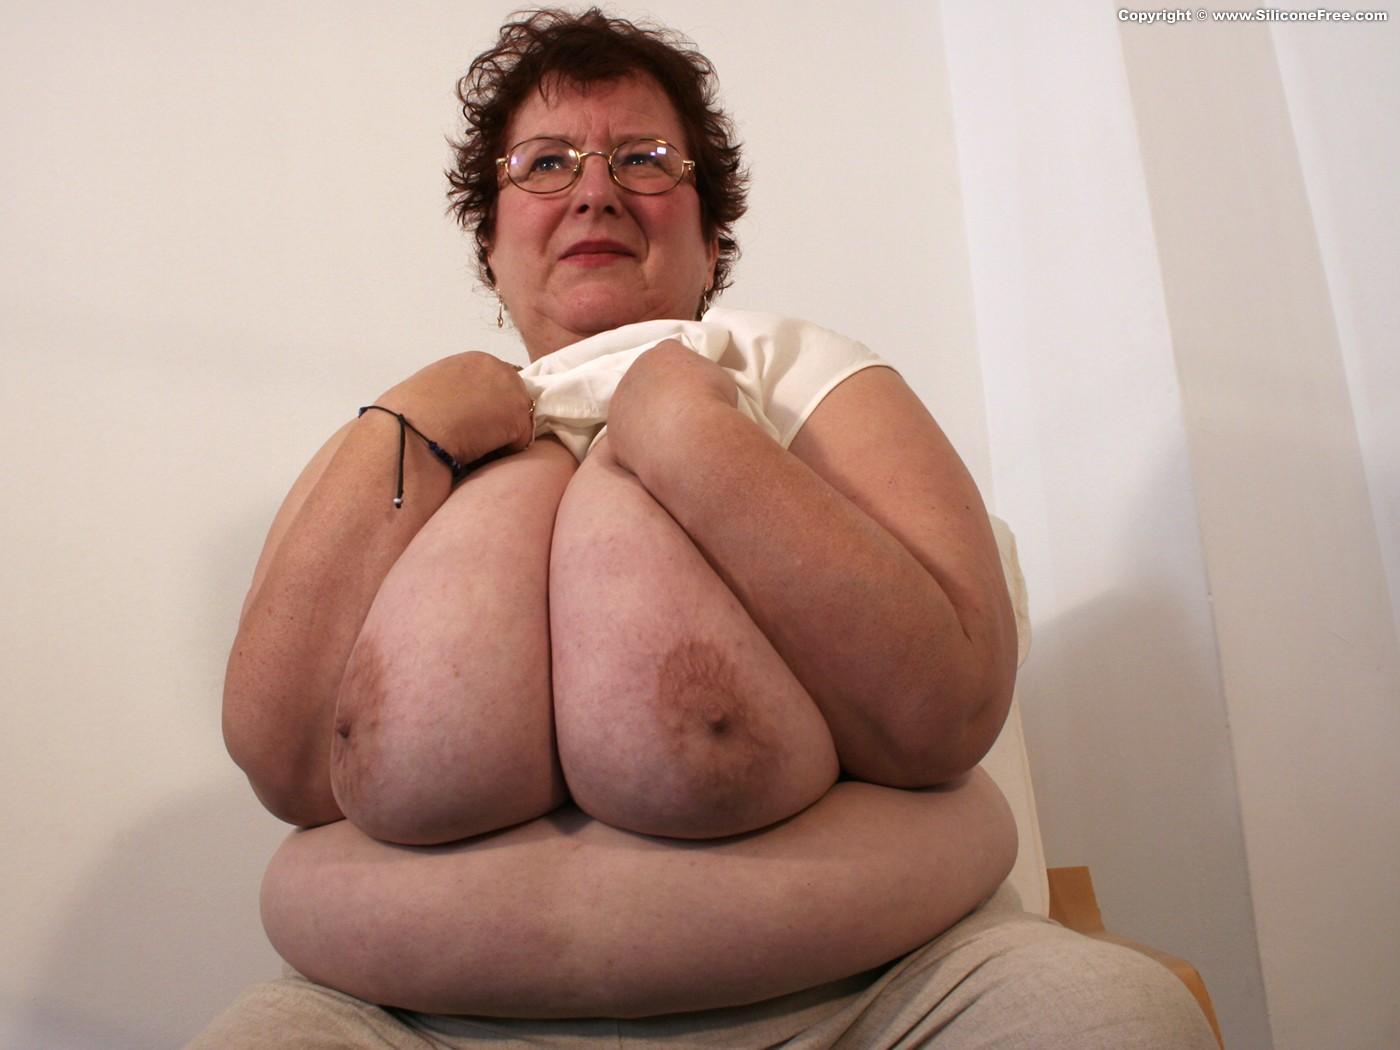 Fattest Tits - Fat sloppy tits - MegaPornX.com